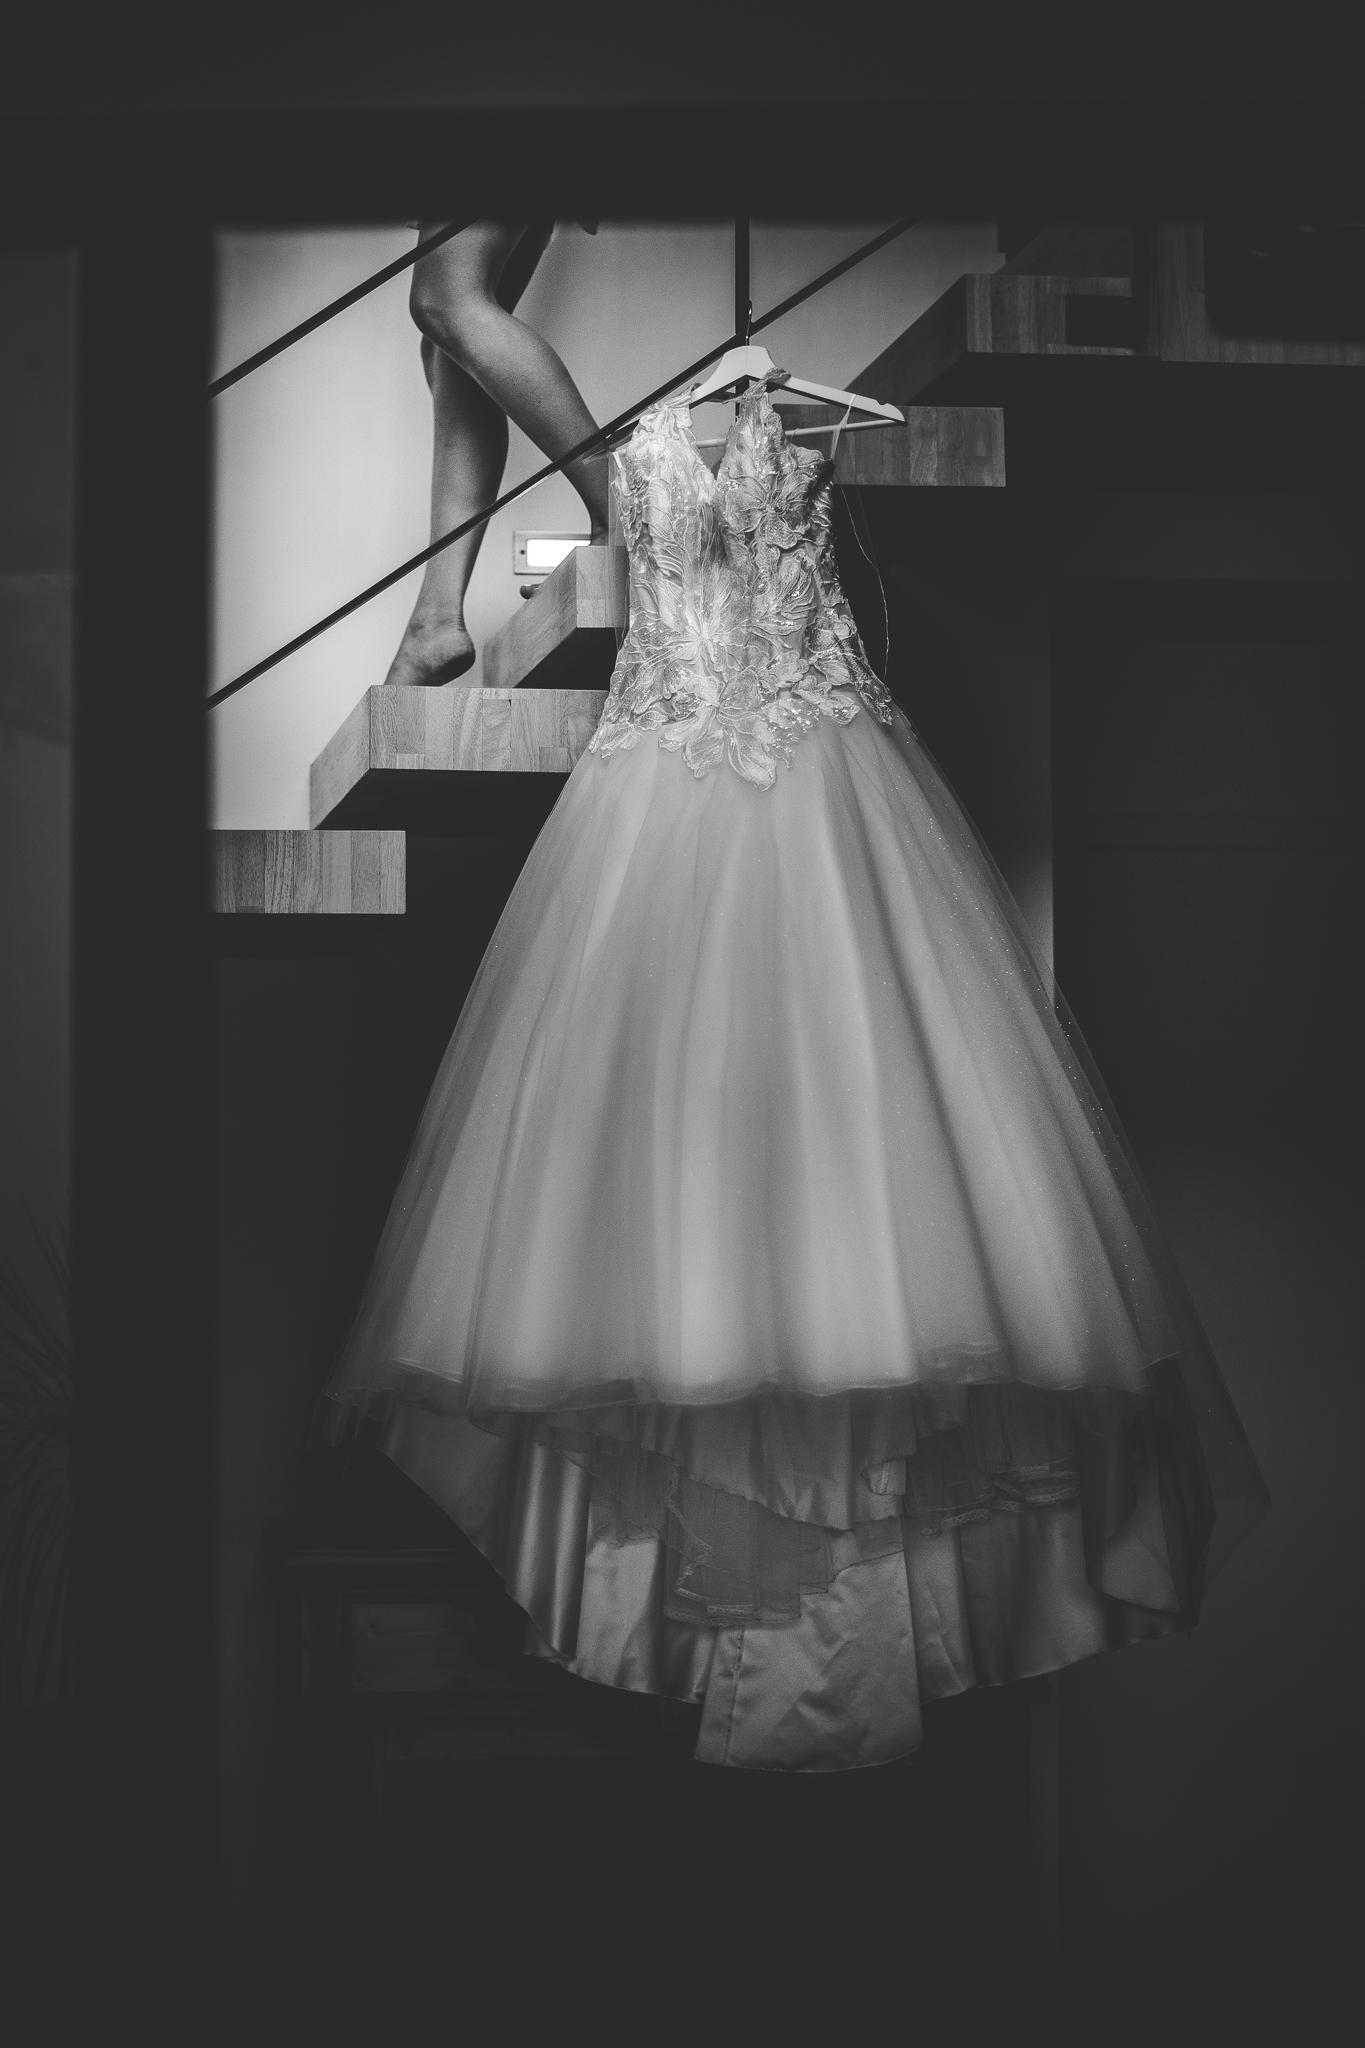 reportage mariage photo habillage preparatifs la mariee details robe mariage auch gers